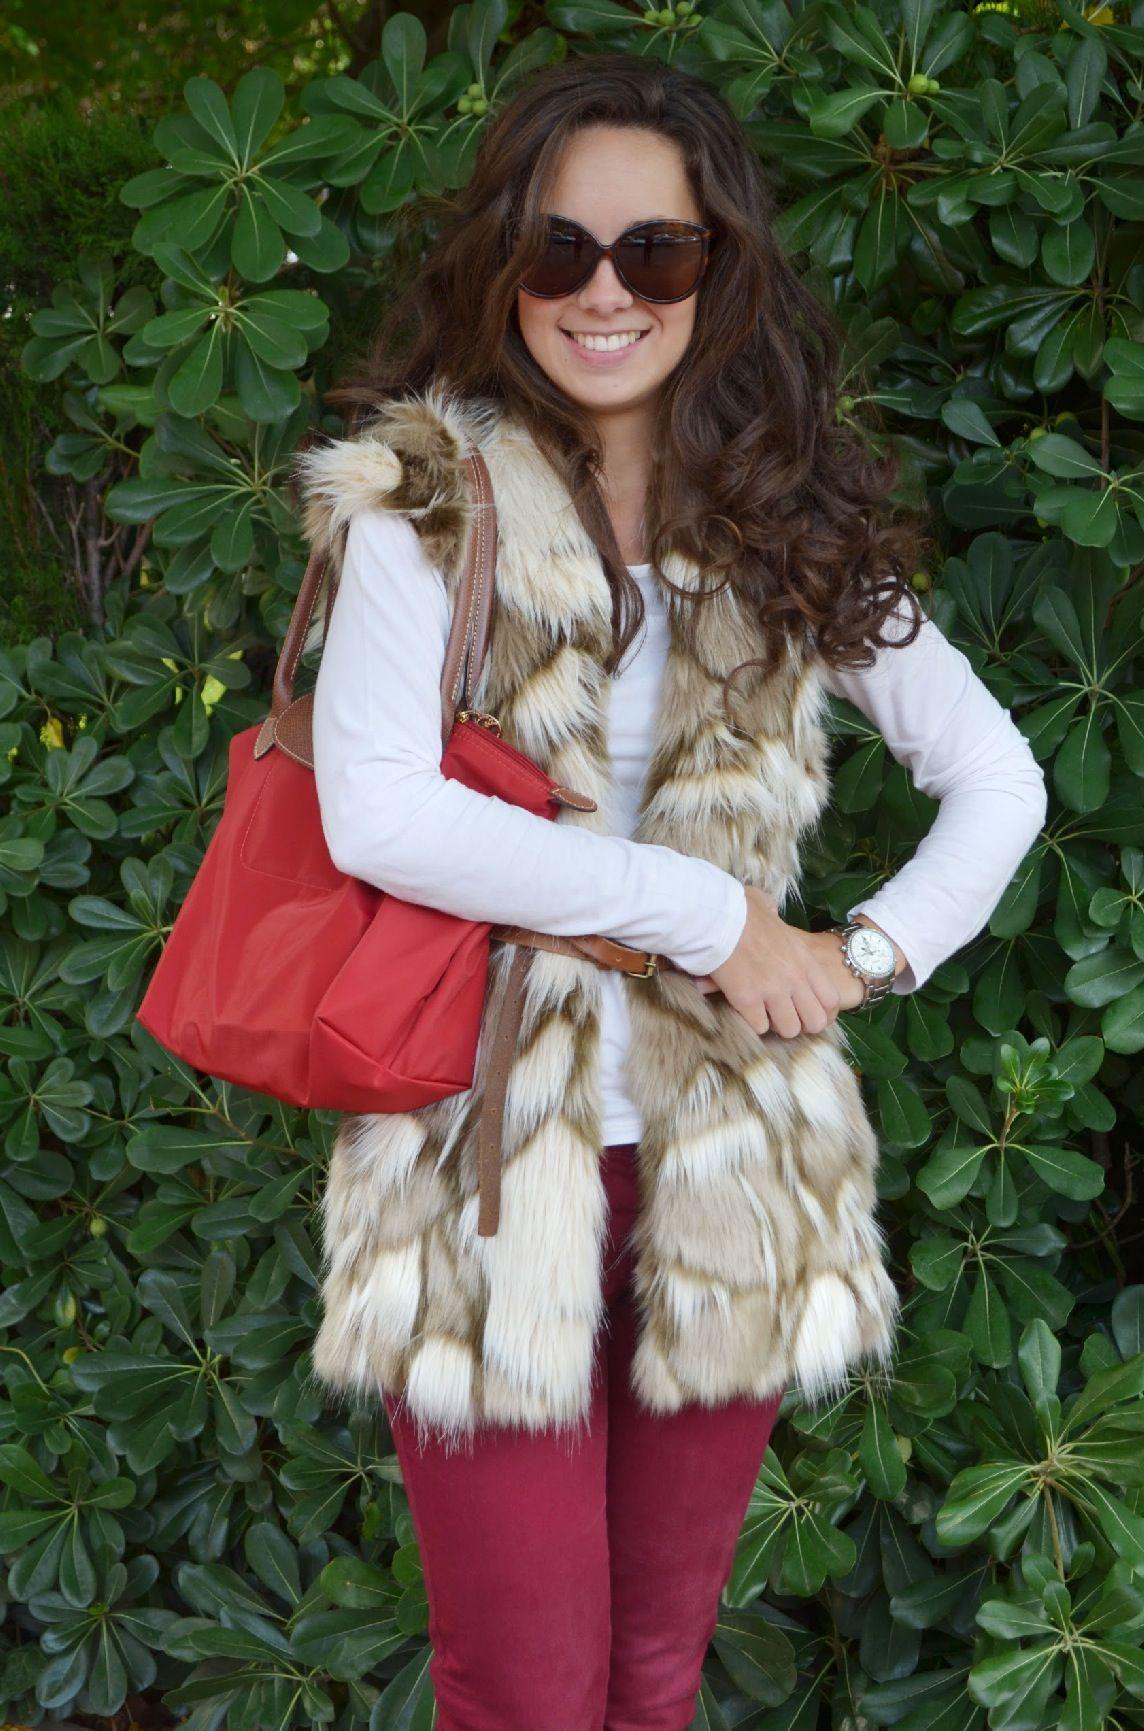 Chaleco de pelo sintético // Synthetic Fur Vest : Street Style Outfit : MartaBarcelonaStyle's Blog